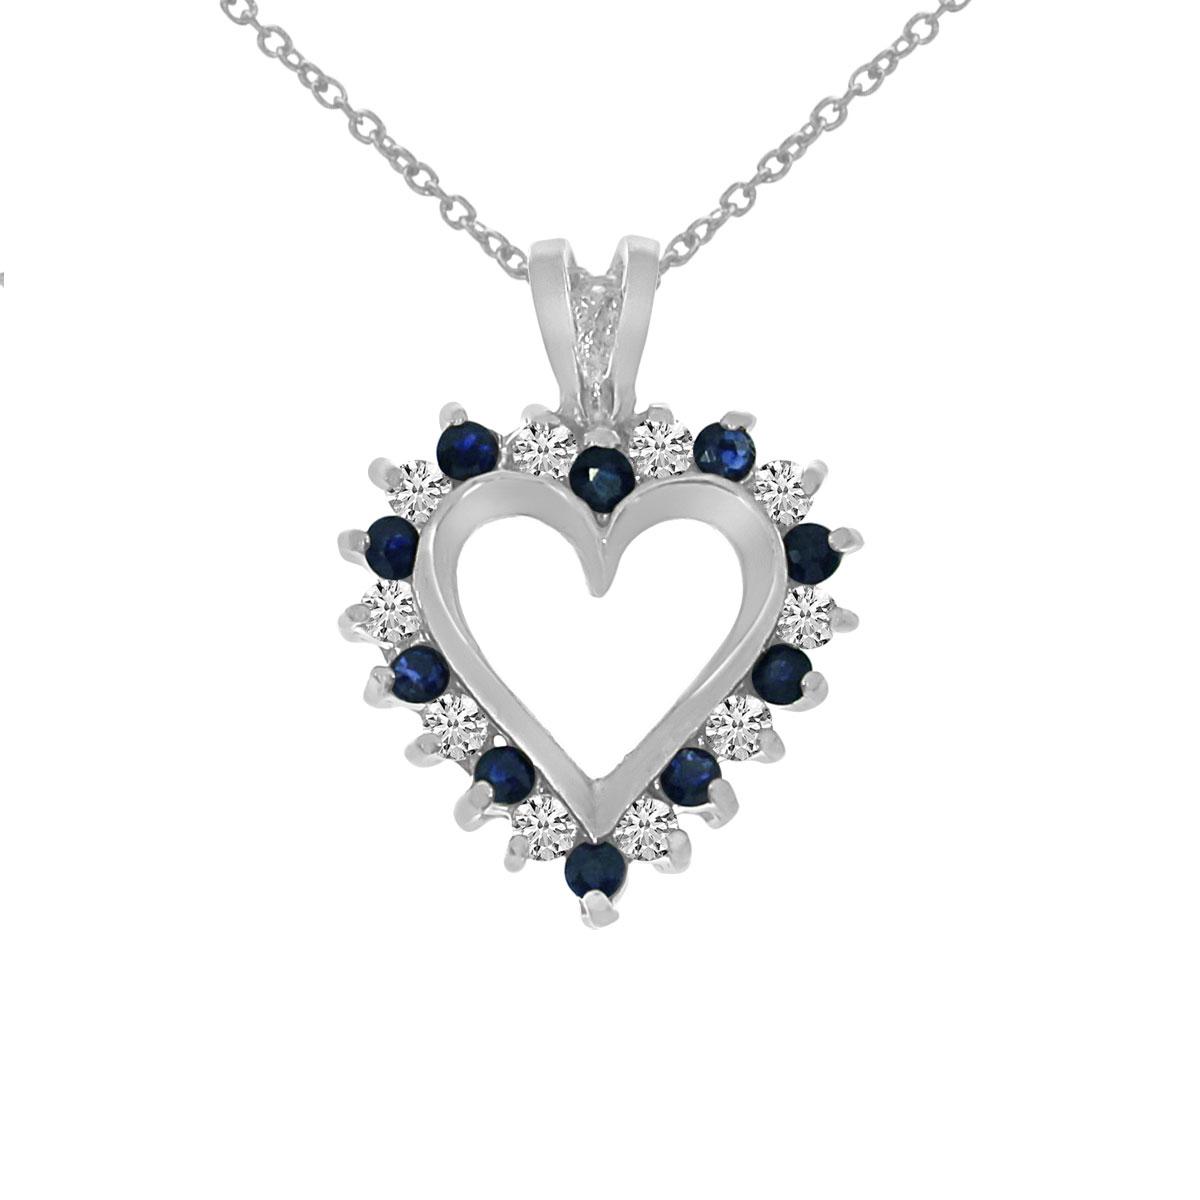 14k White Gold Sapphire and Diamond Heart Shaped Pendant